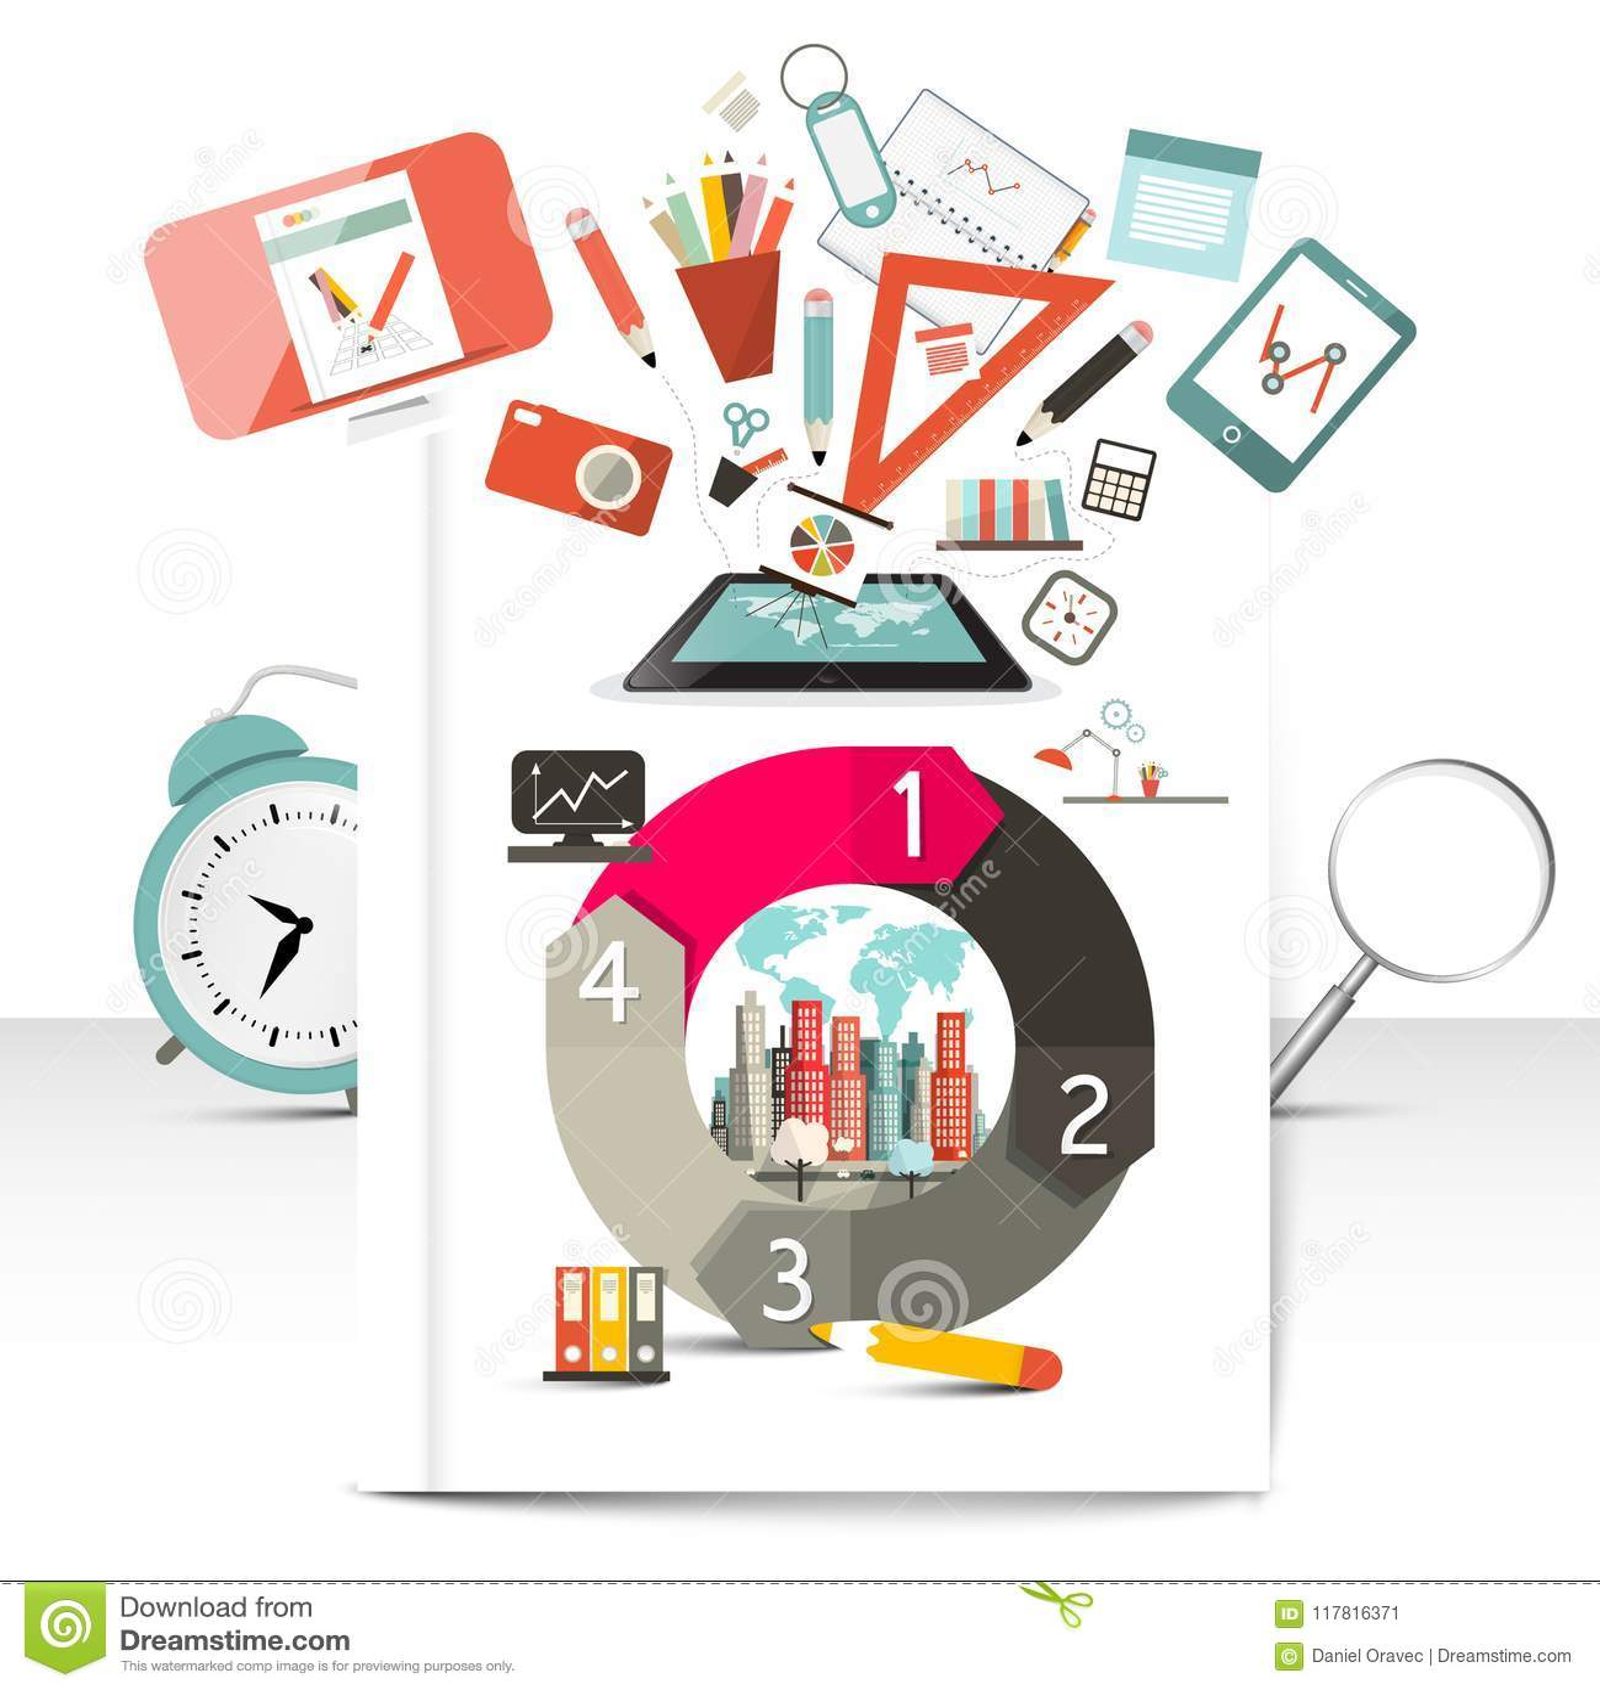 Creative Infographic Items.